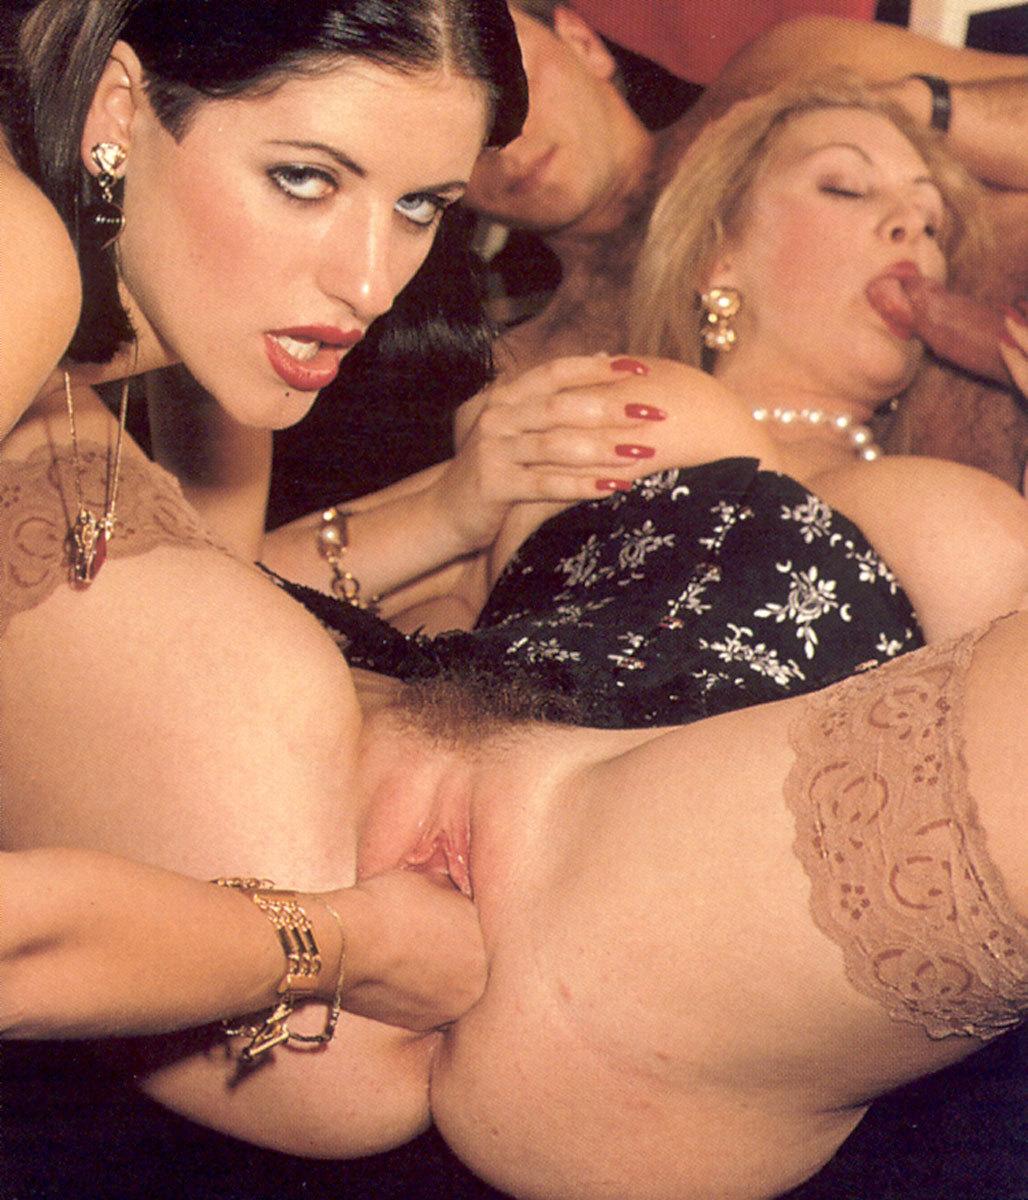 Vintage Annette Haven Porn Star - Nuslutcom-8027